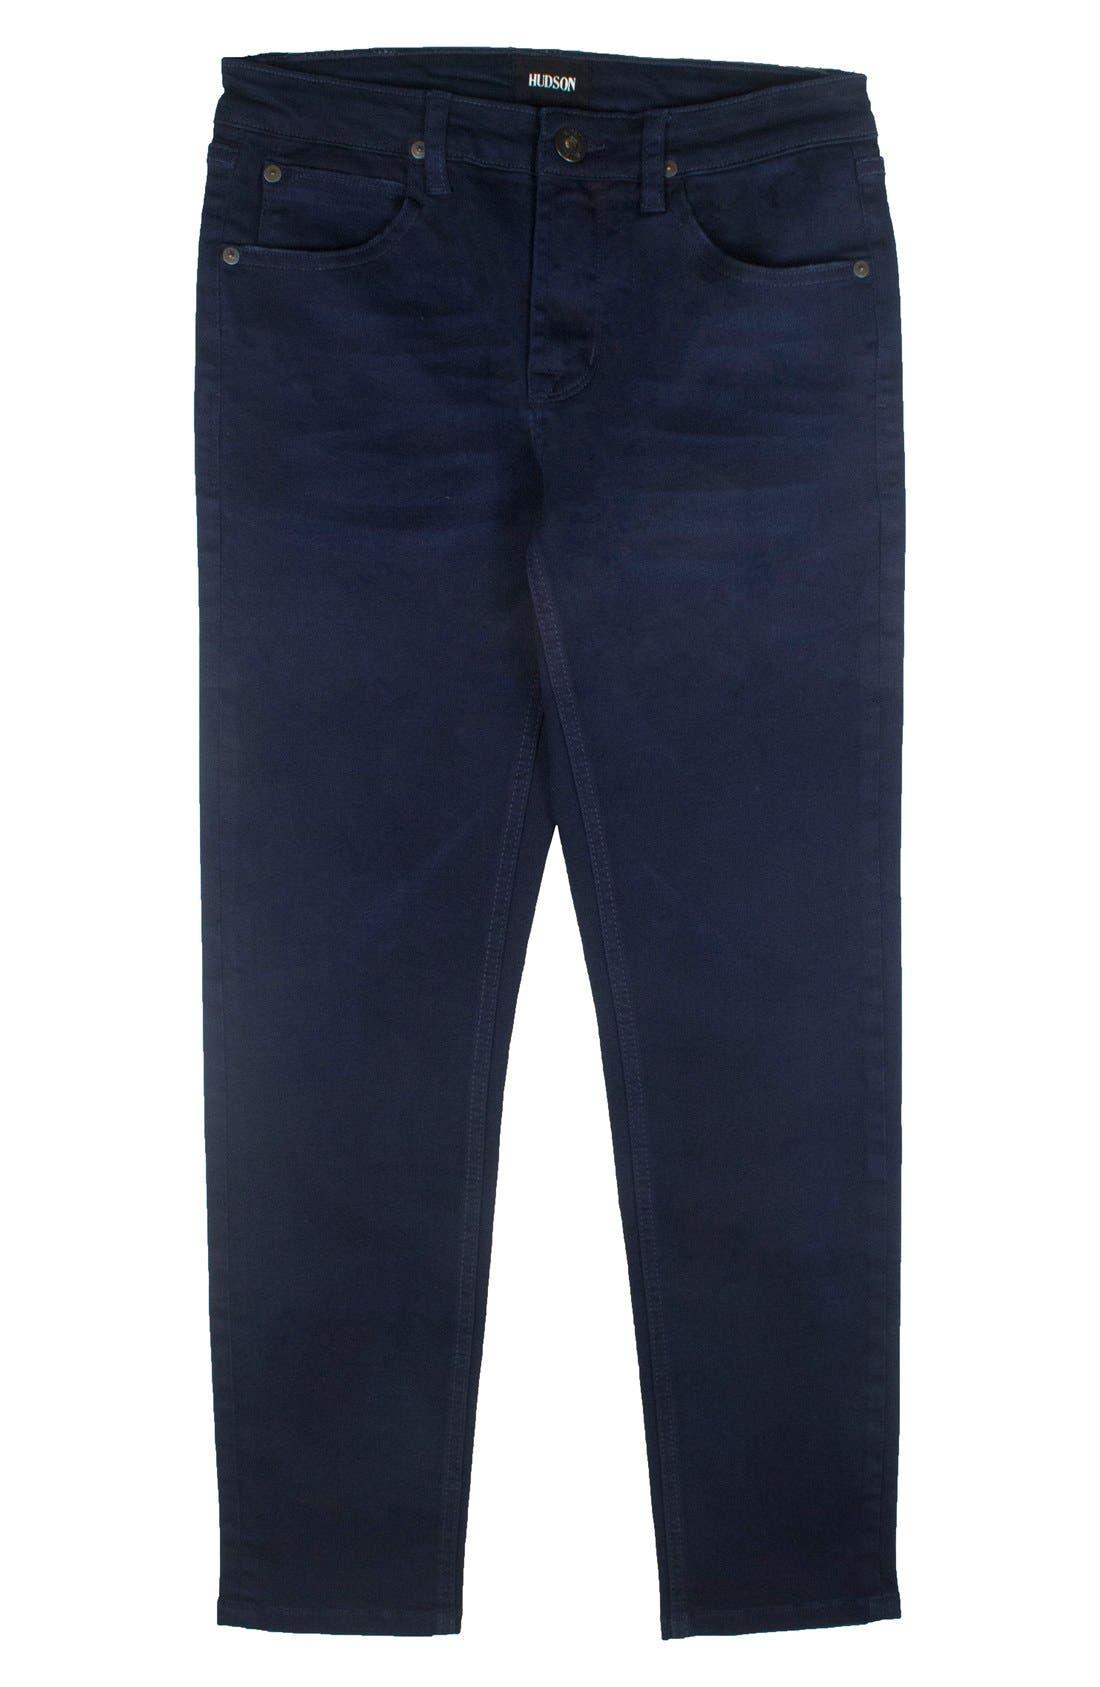 Jagger Slim Fit Straight Leg Jeans,                             Main thumbnail 4, color,